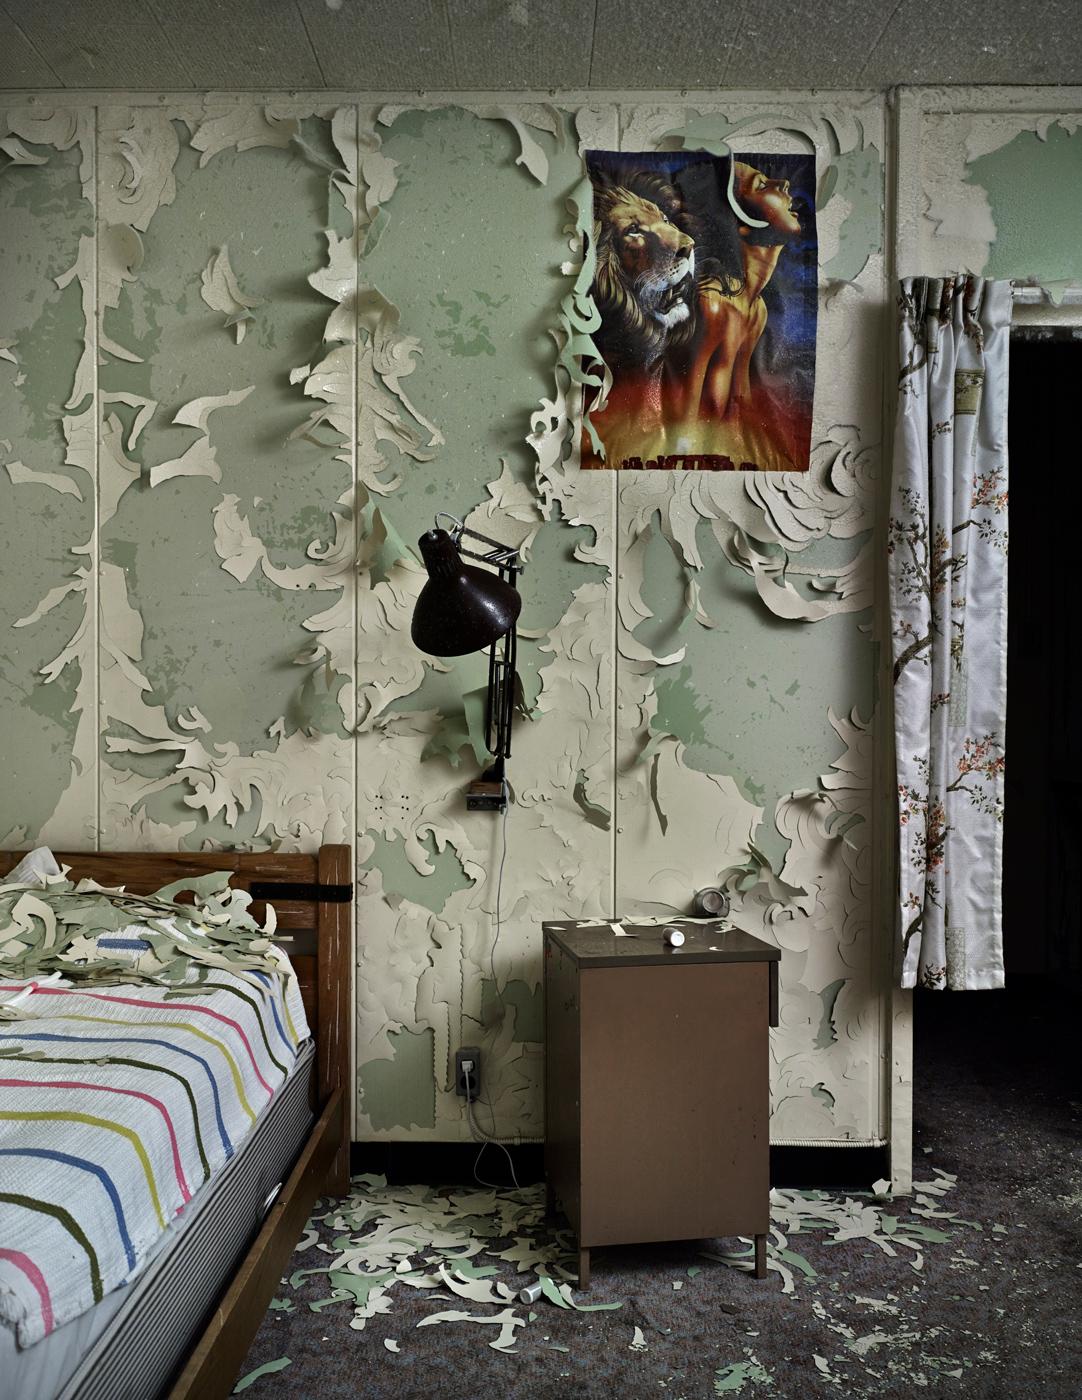 DYE3 Interior #4 Bedroom, 119cm x 92cm, Digital Pigment Print, Edition of 7, 2013